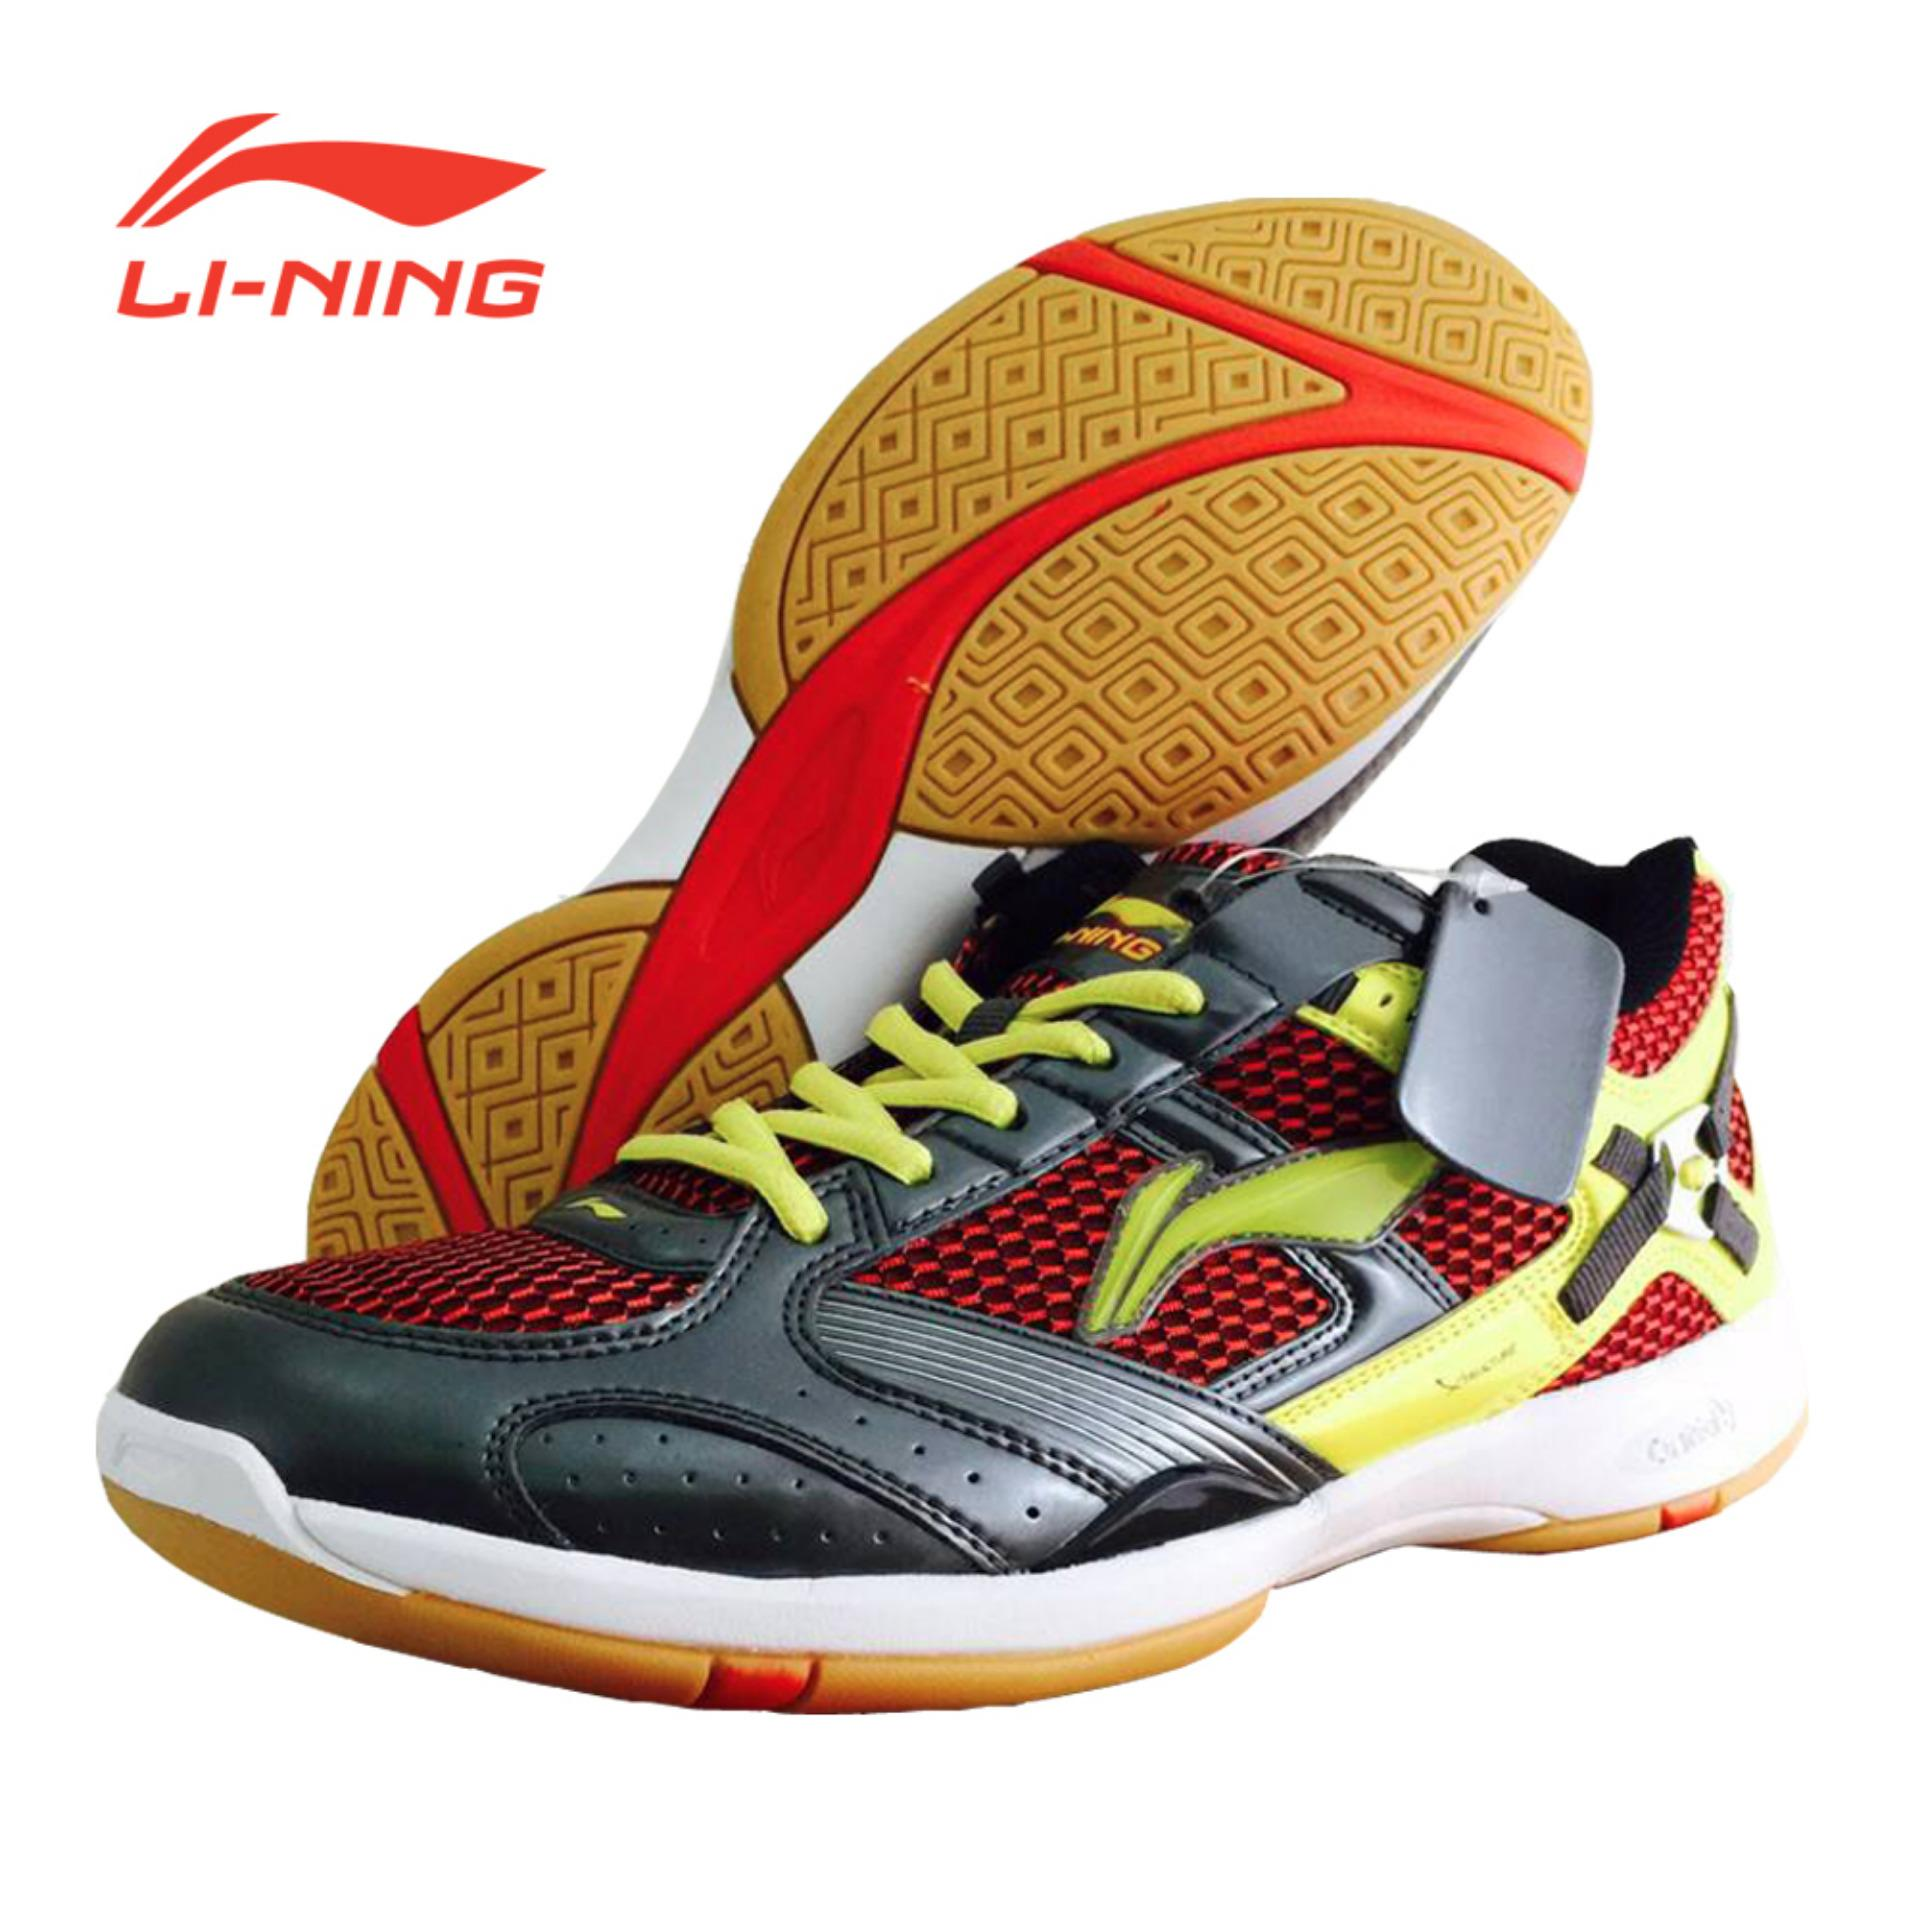 li ning badminton shoes super